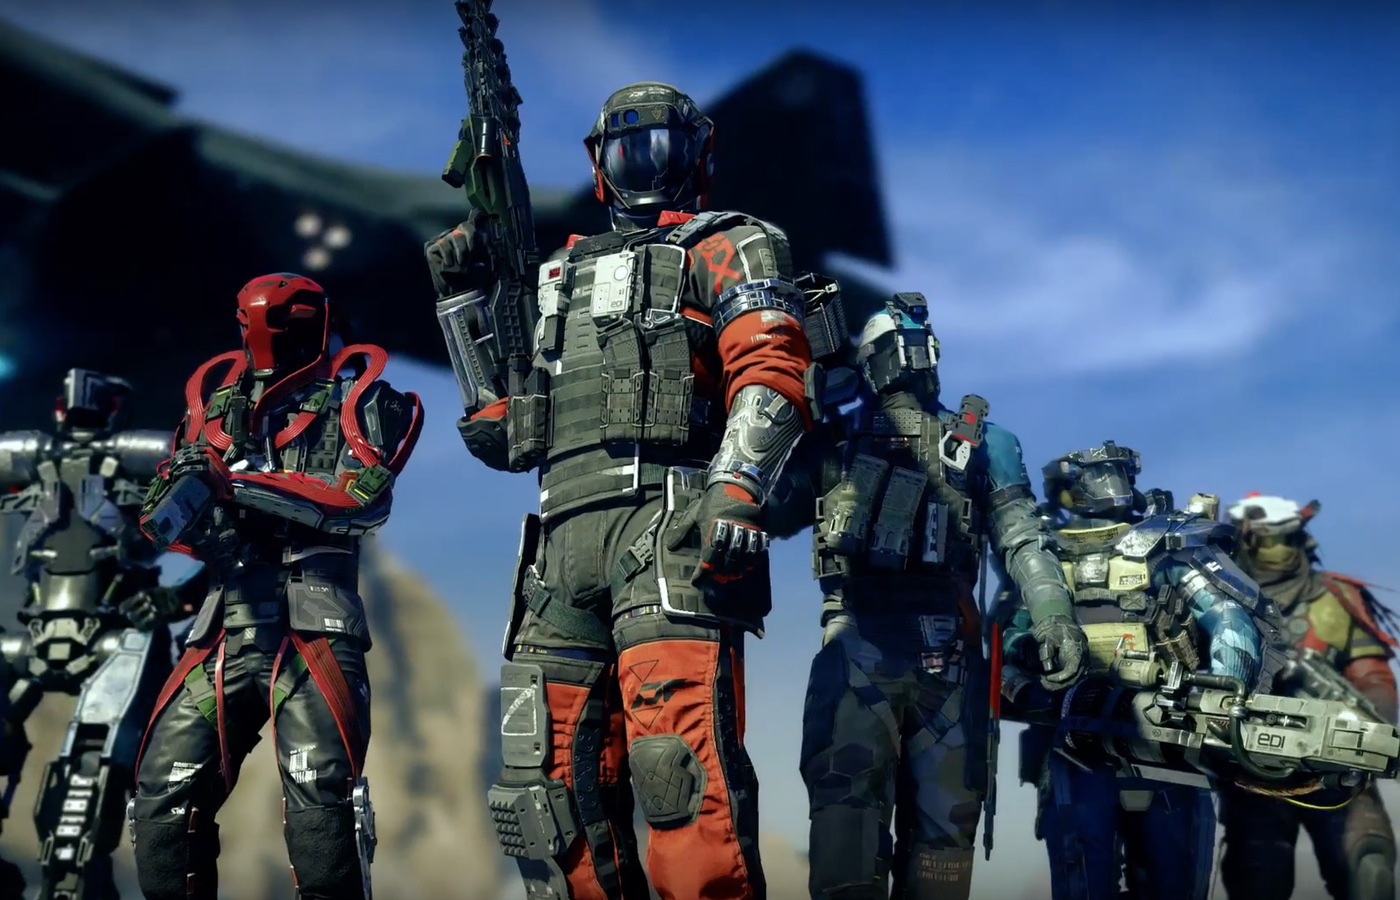 call-of-duty-infinite-warfare-multiplayer-game-img.jpg